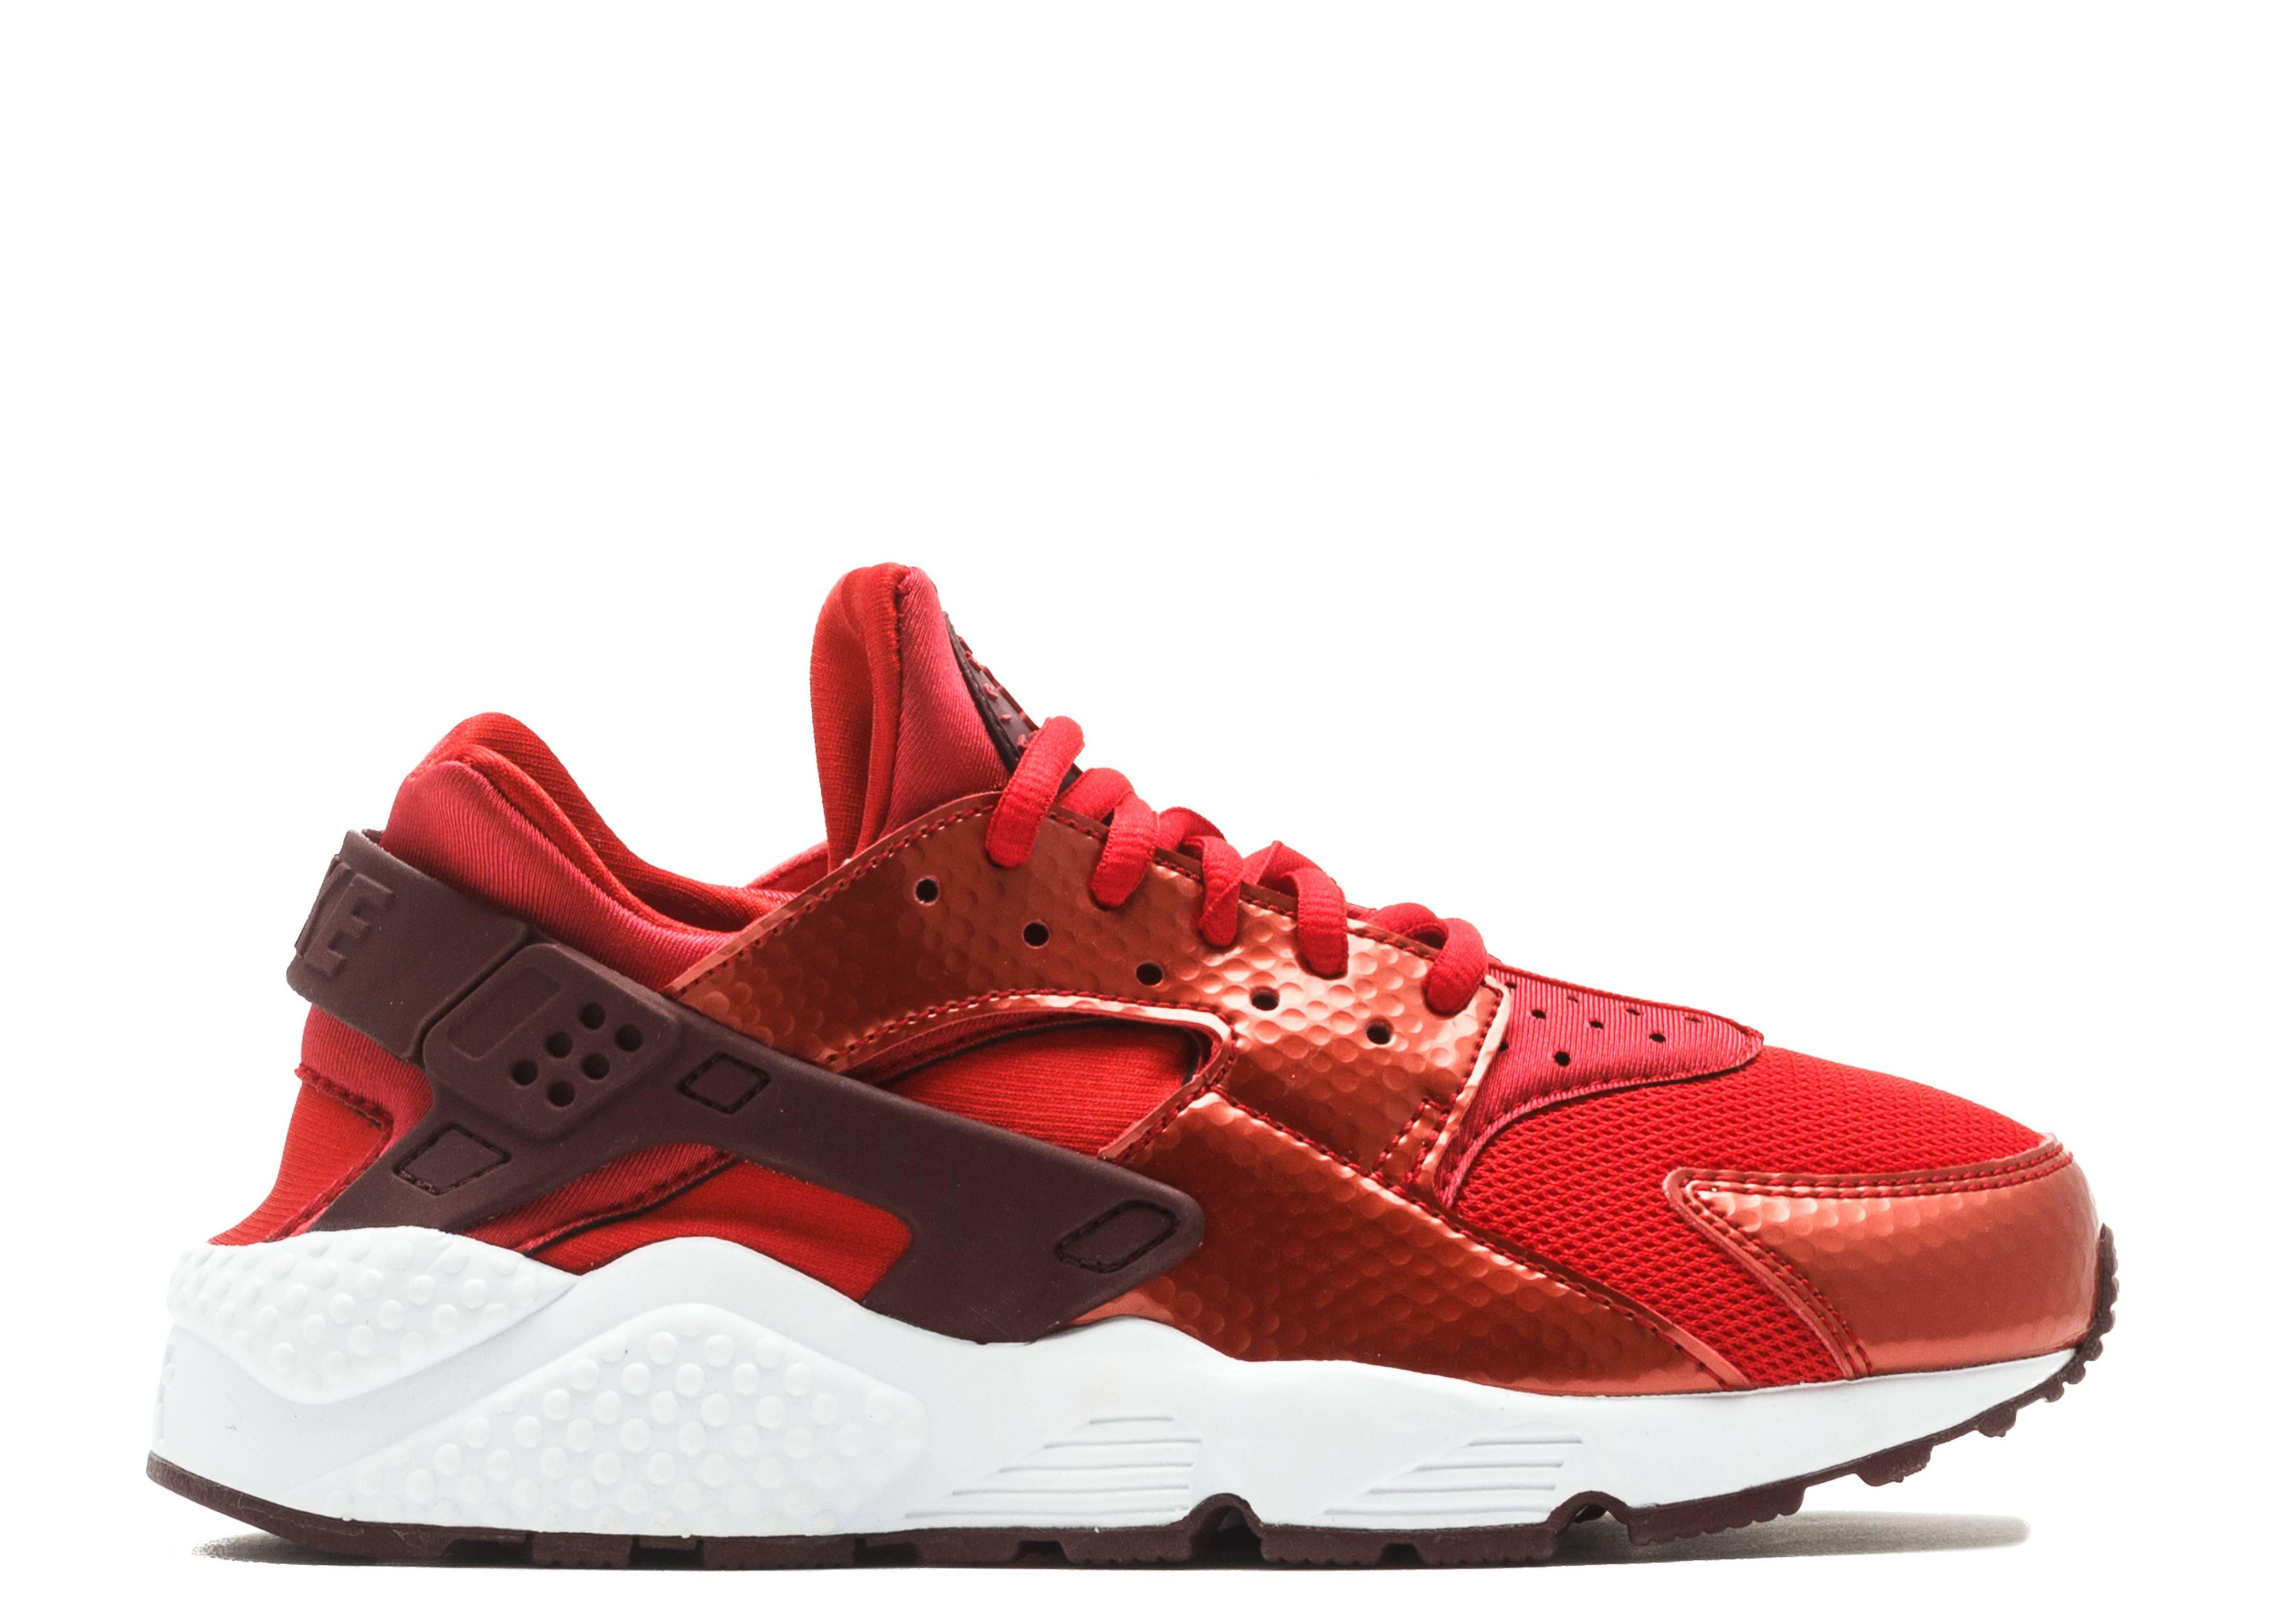 W s Air Huarache Run - Nike - 634835 605 - university red maroon-white  04c032f81cce